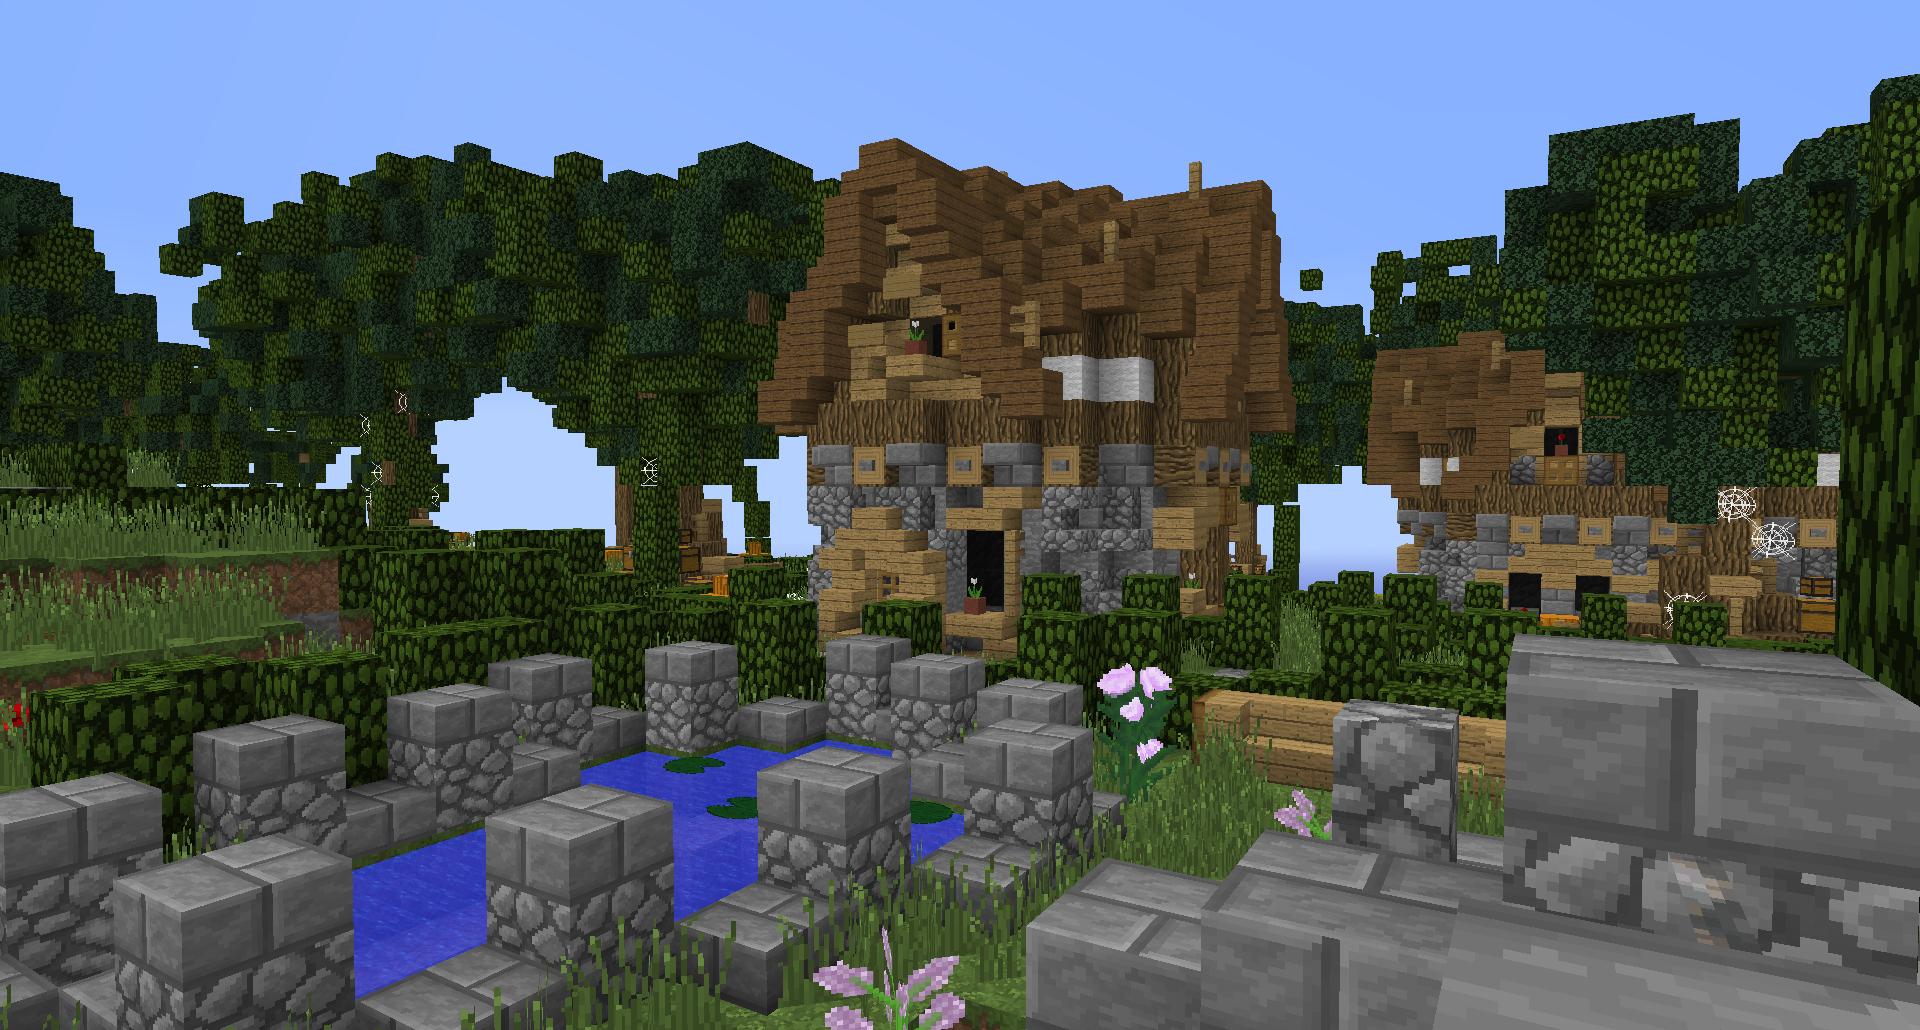 #minecraft #buildings #simple #fantasy #lollyherz #village #house #garden #steampunk #build #fantasygarden #pond